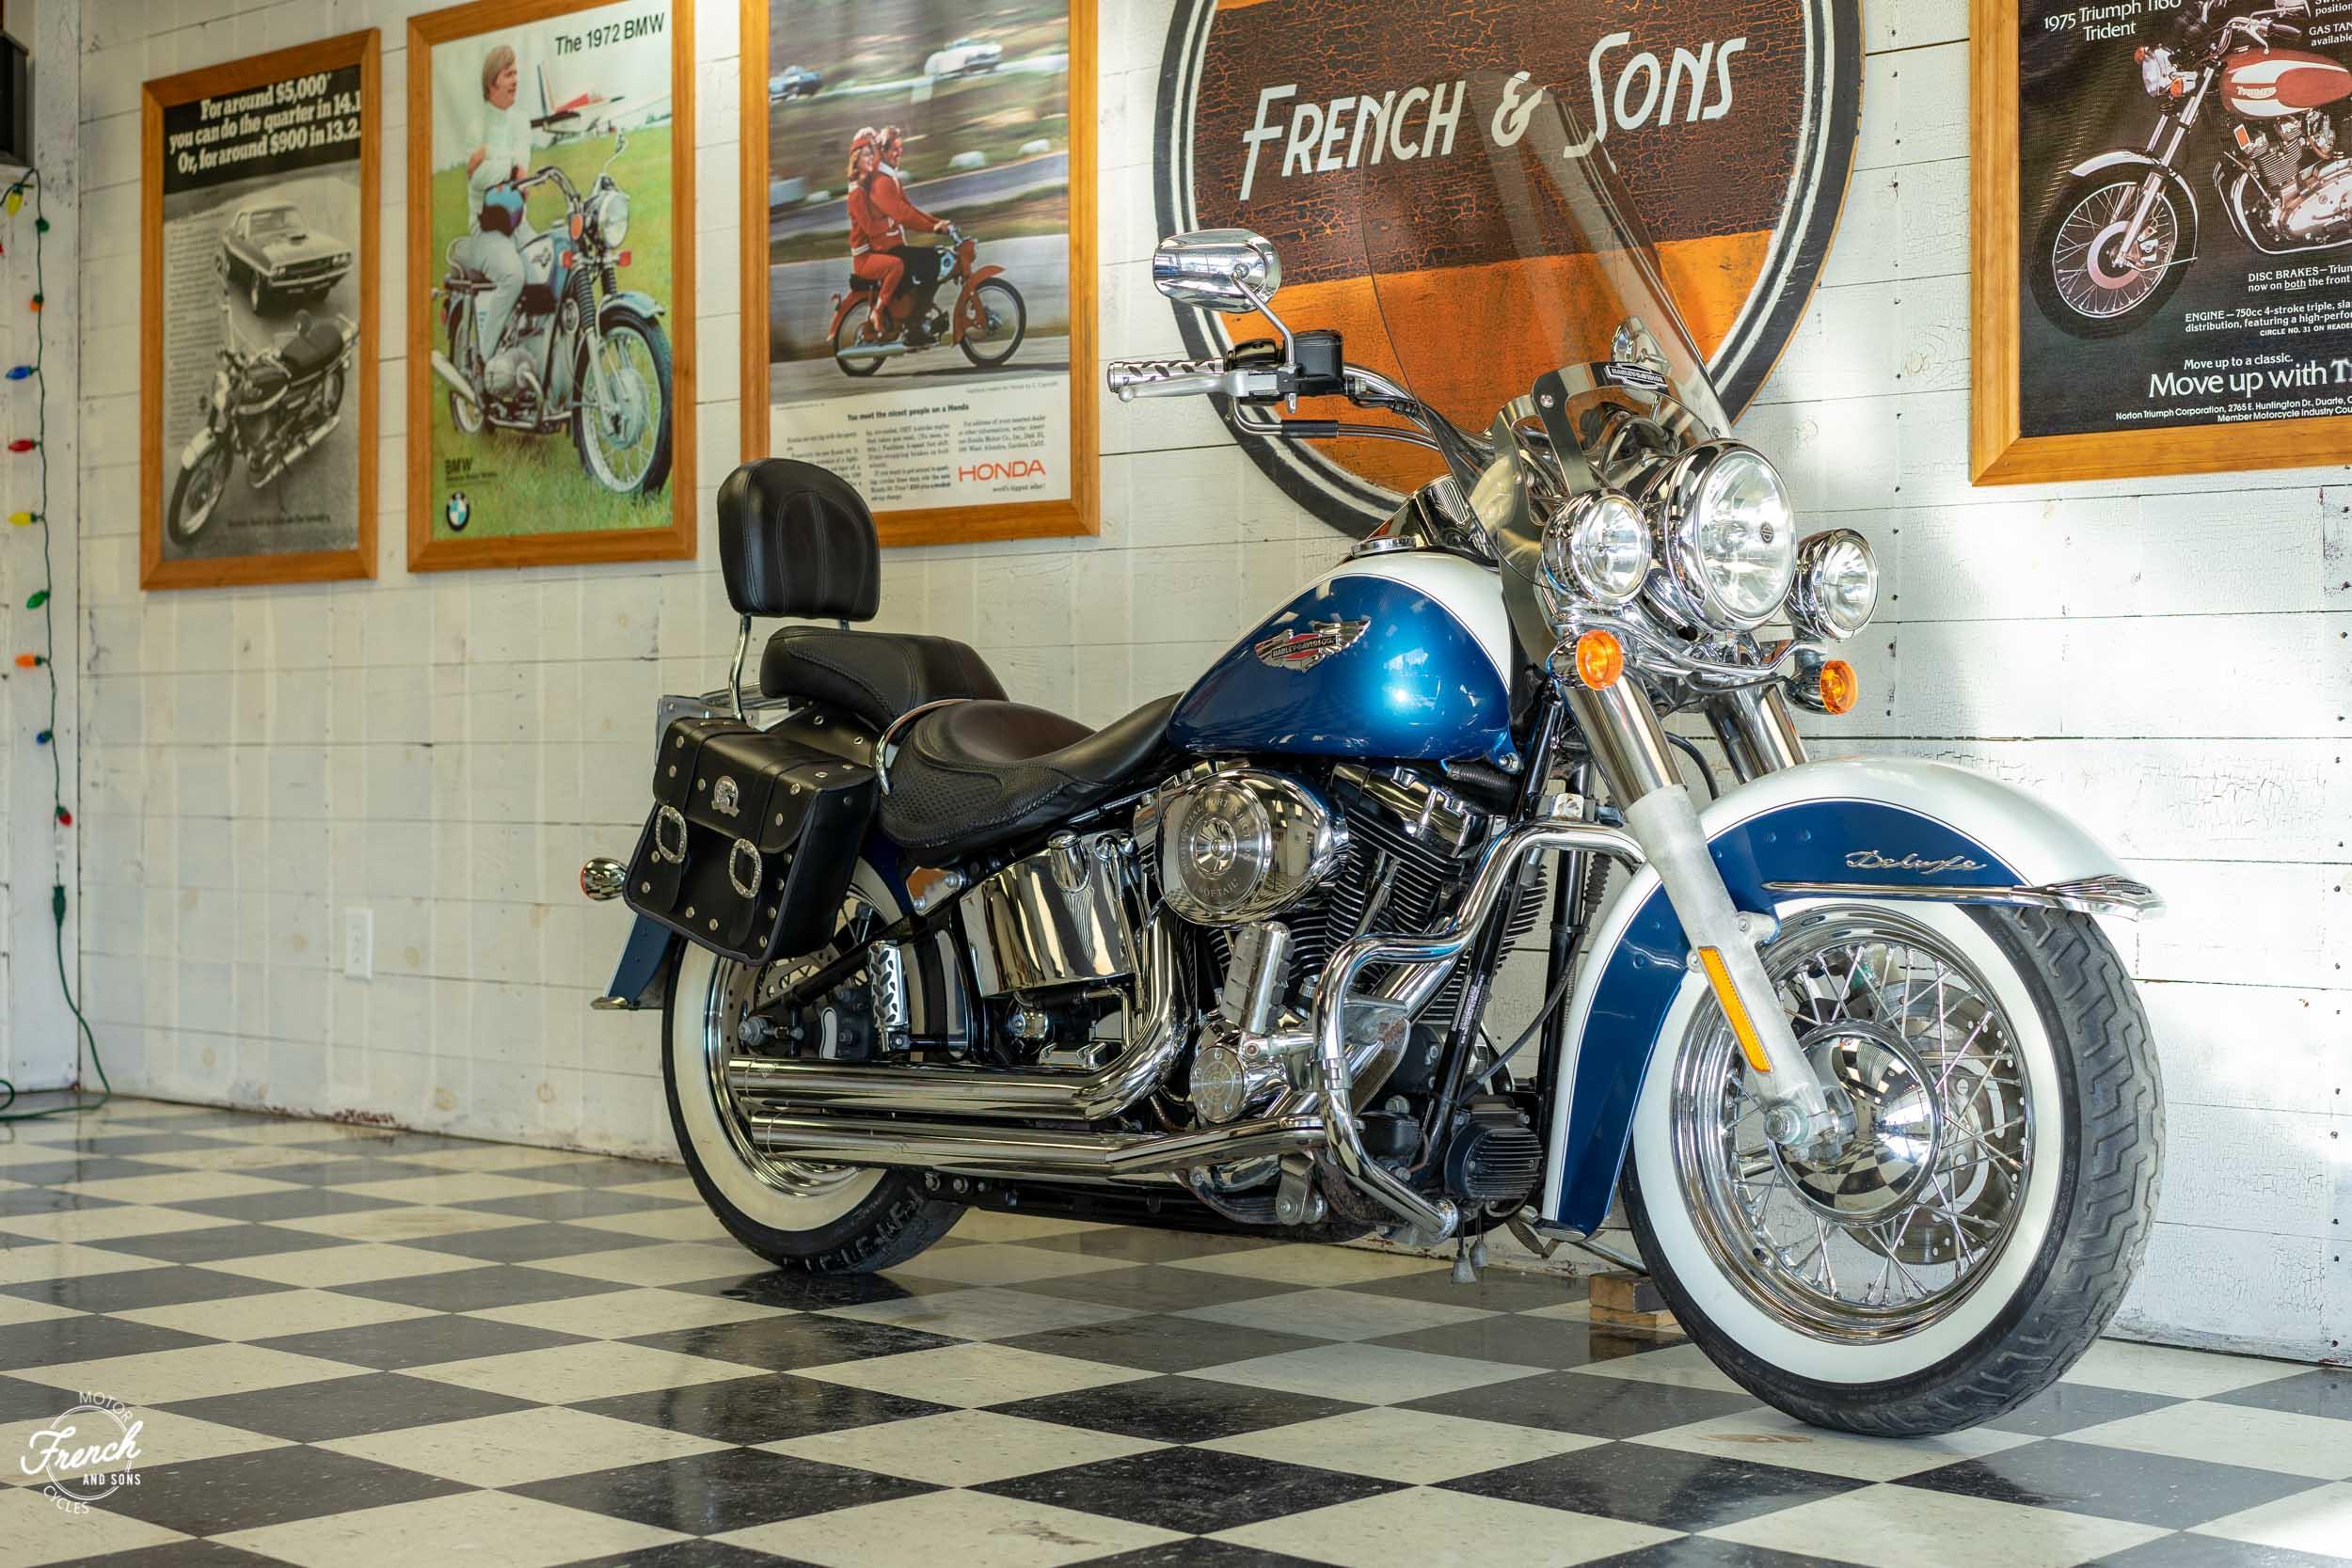 2005_Harley_Davidson_Softail_Deluxe-6.jpg